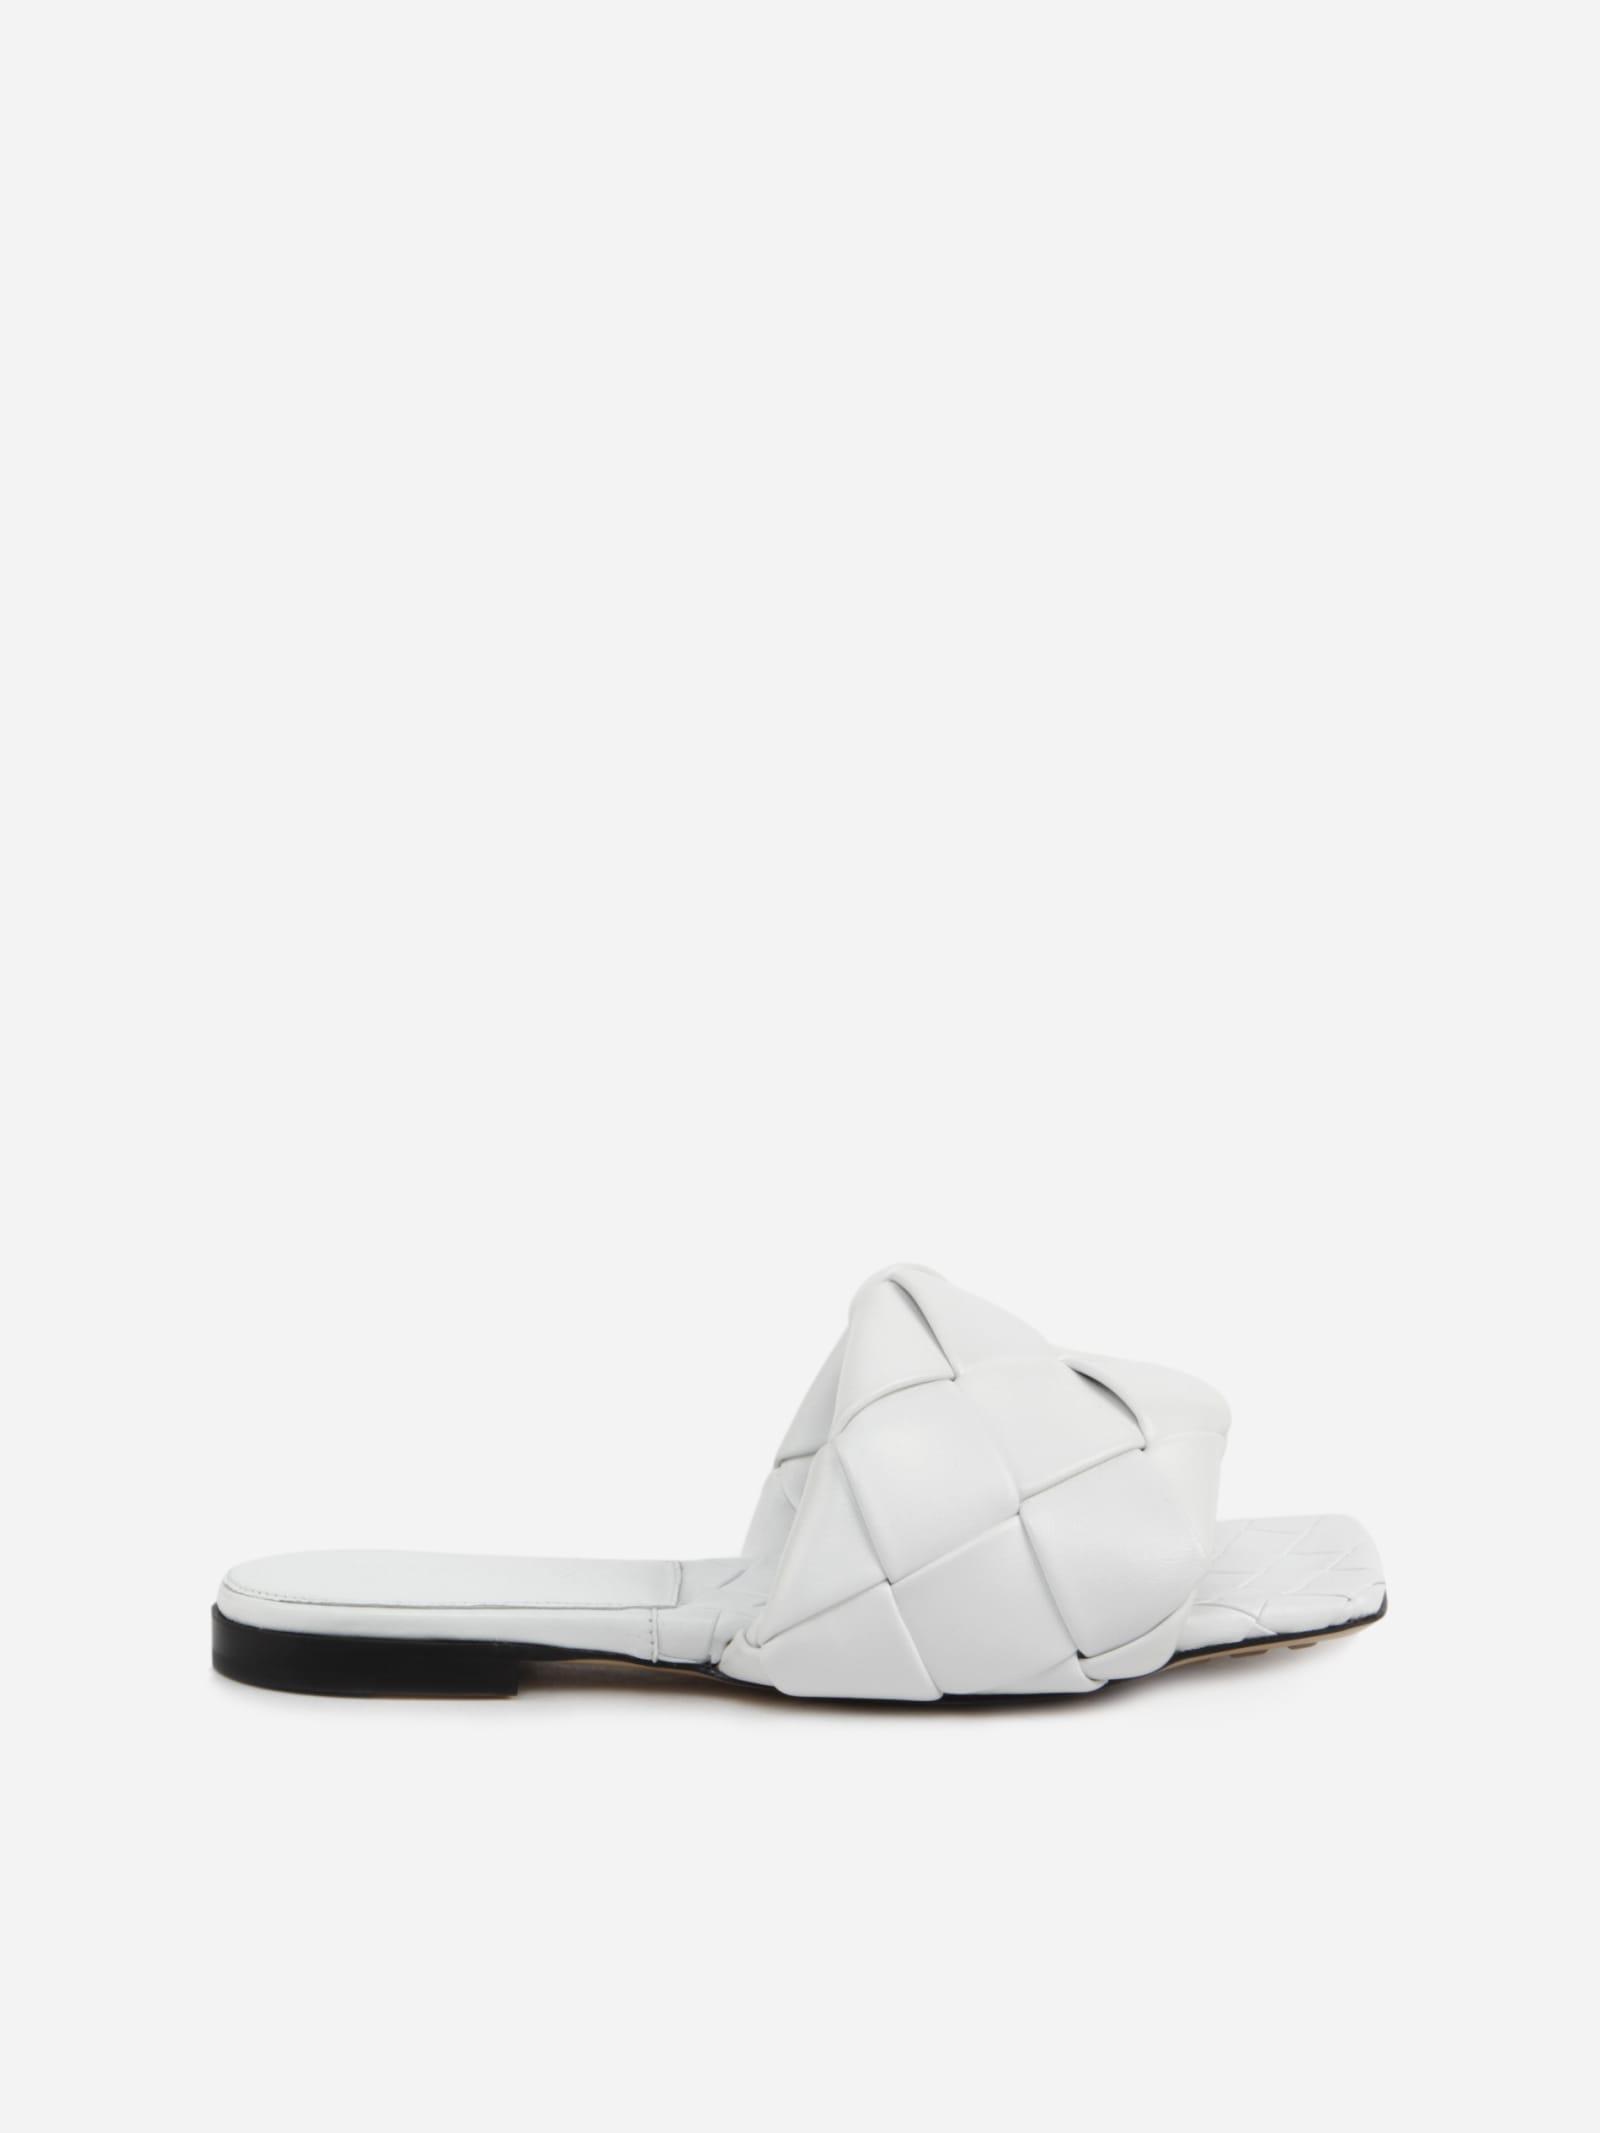 Buy Bottega Veneta Lido Flat Sandals In Leather With Woven Pattern online, shop Bottega Veneta shoes with free shipping